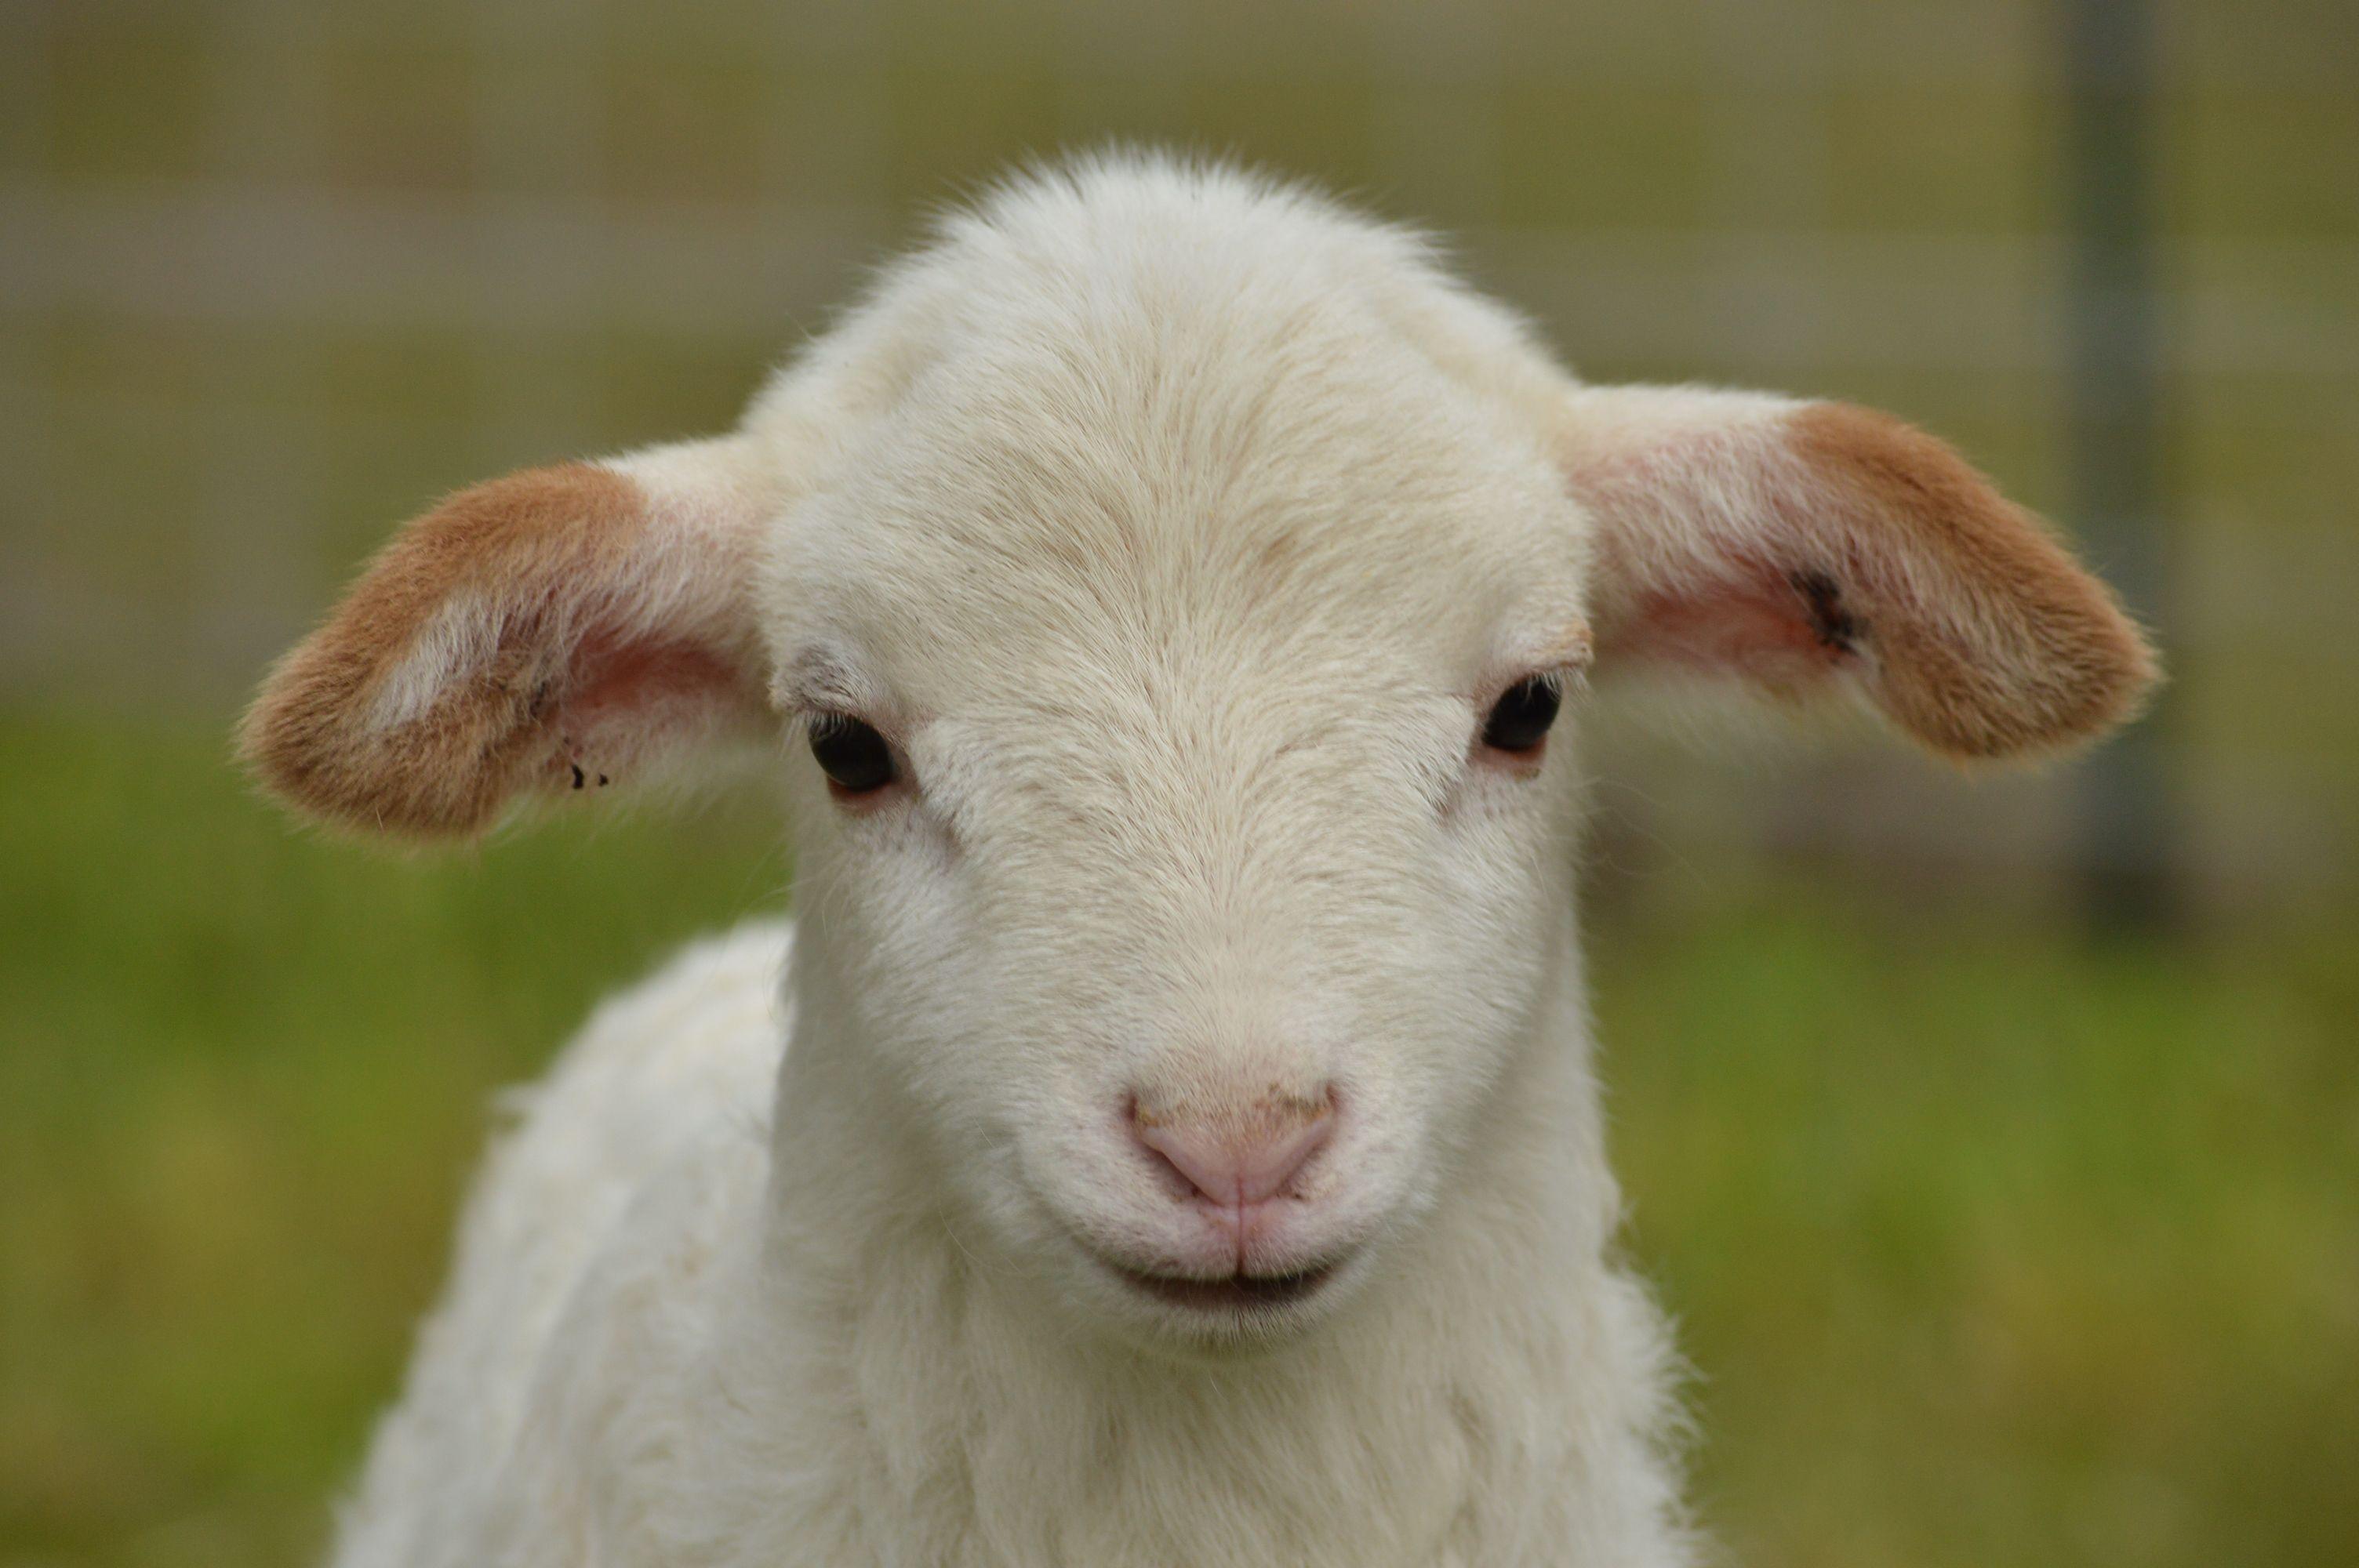 katahdin lamb | Sheep | Katahdin sheep, Cute goats, Sheep, lamb